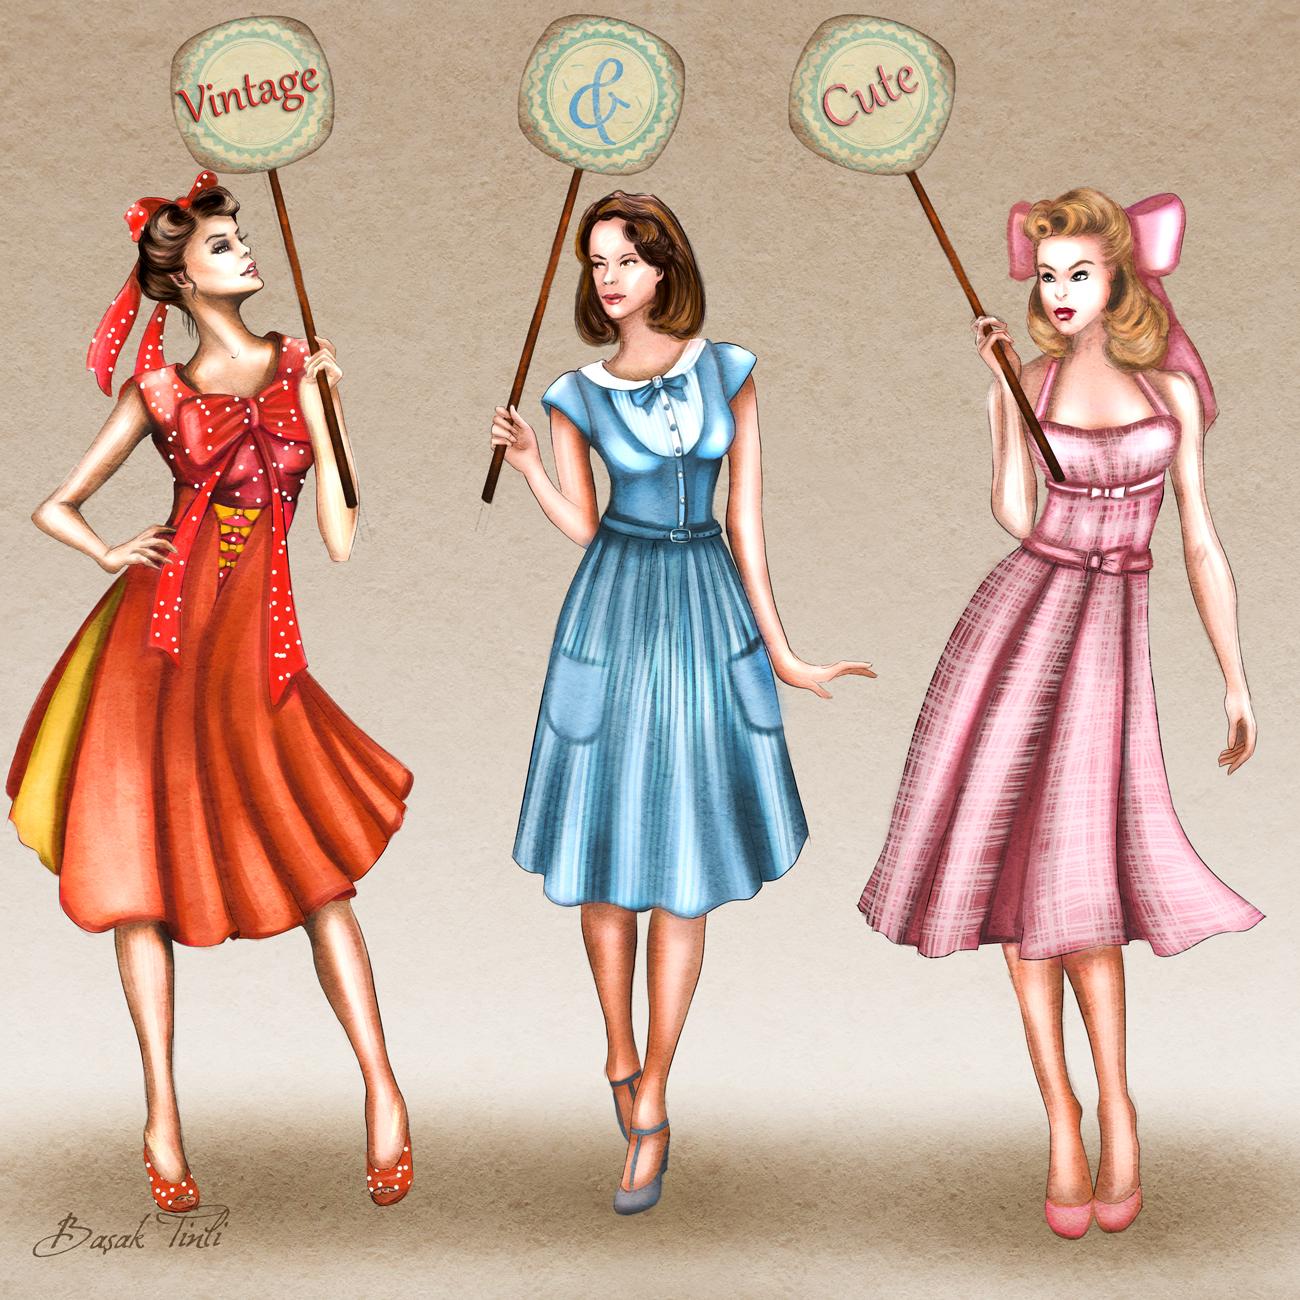 50s inspired vintage dresses fashion illustration by